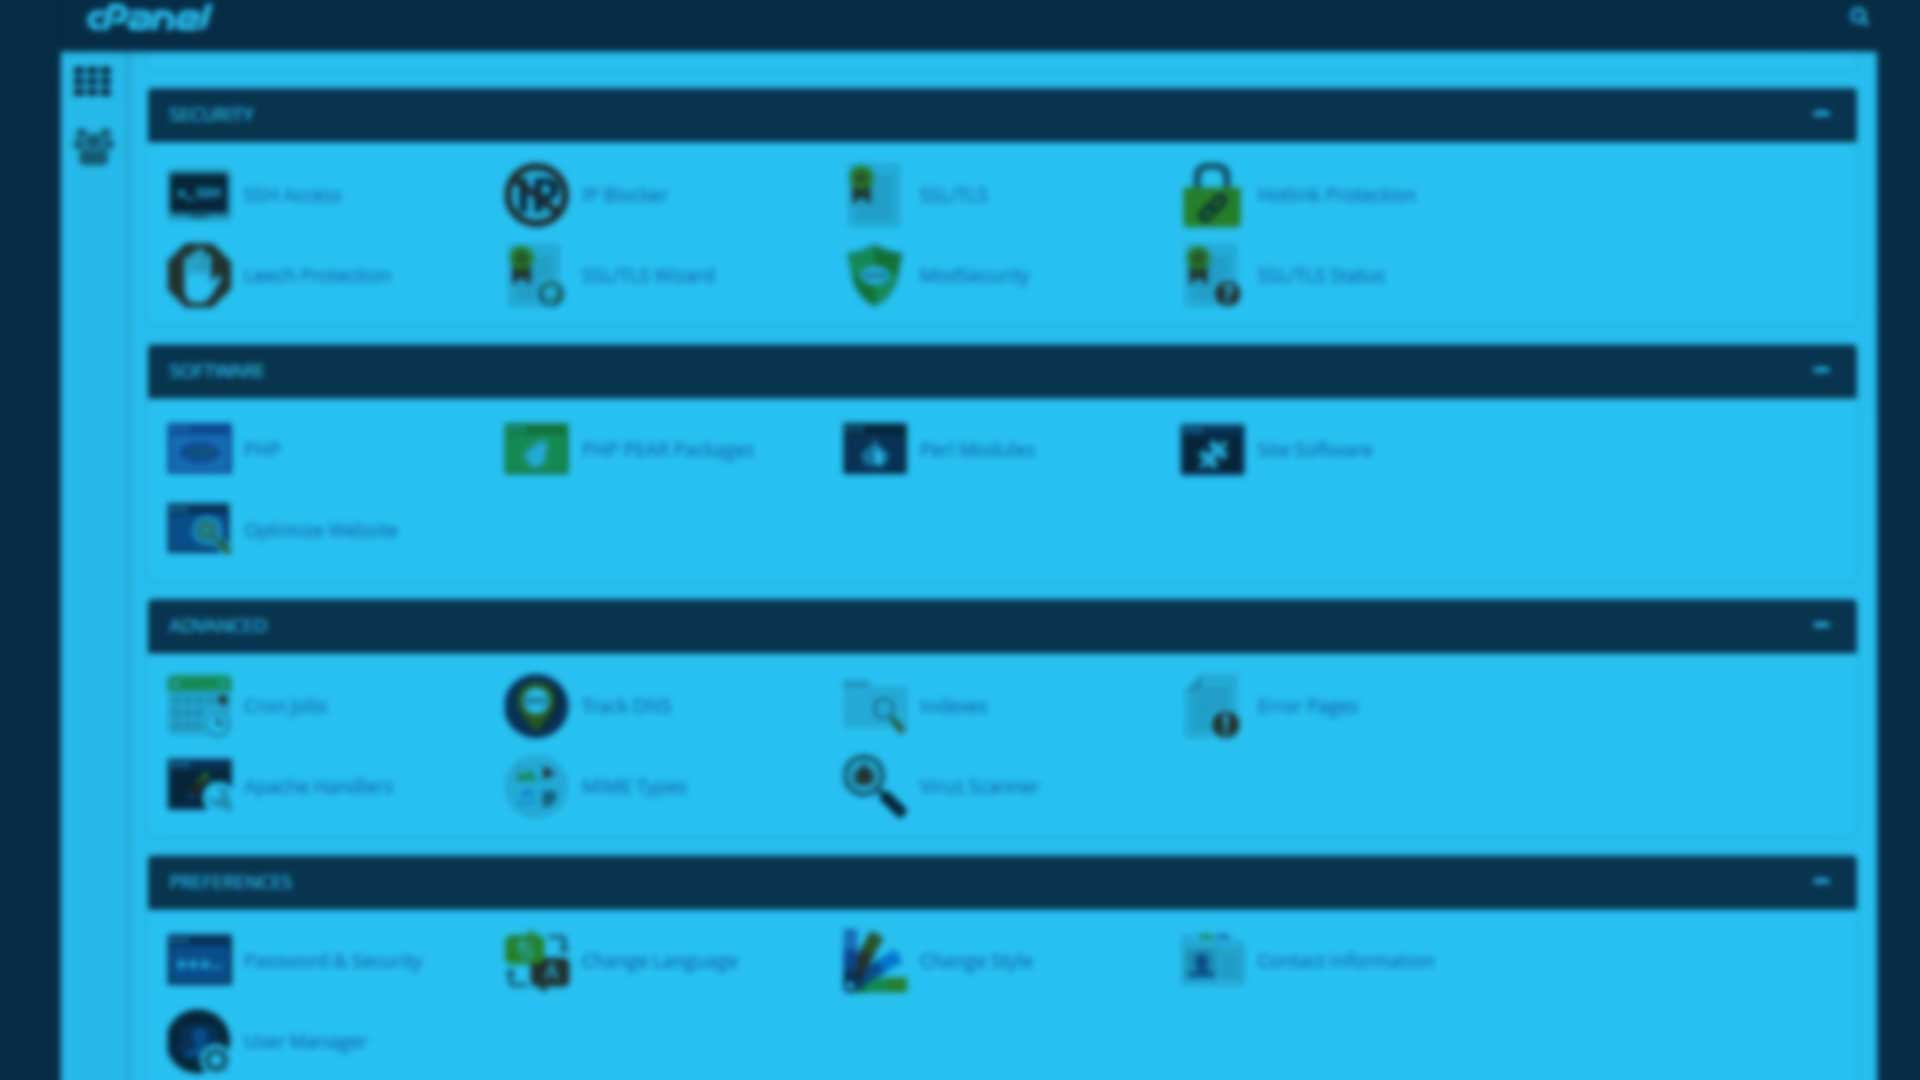 cpanel-sydney-web-hosting-blue-hue